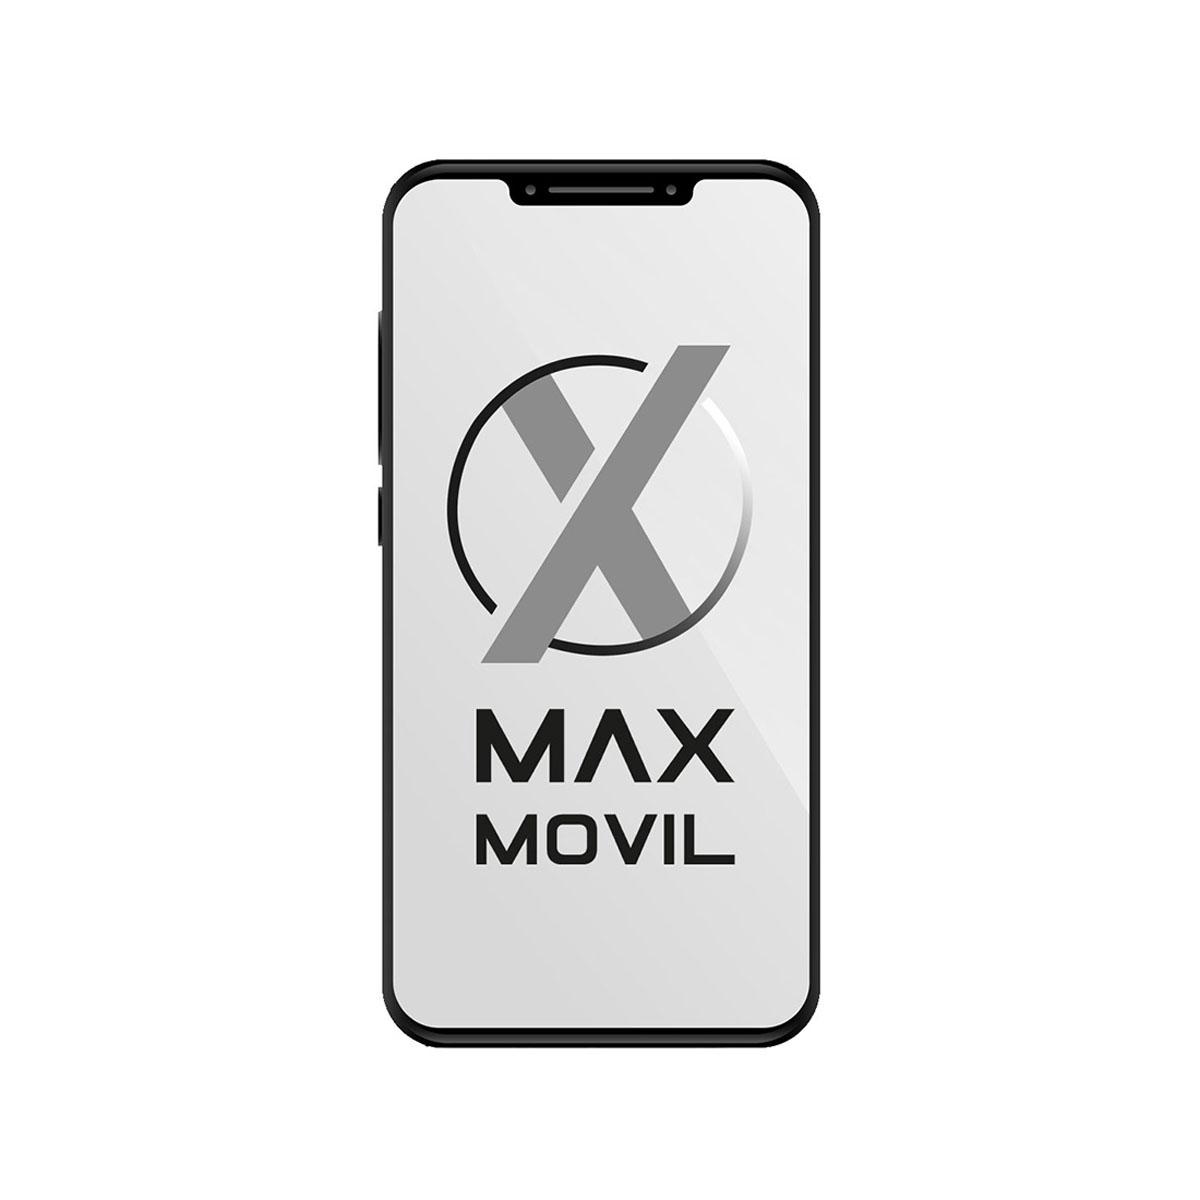 "Reproductor DVD portatil 7"" AURA ,  USB , SD , m/d , salida  a/v ,  salida jack auriculares , bateria ,  12 v o 220 v , bolsa de transporte y sujeccion en cabezal del asiento ."